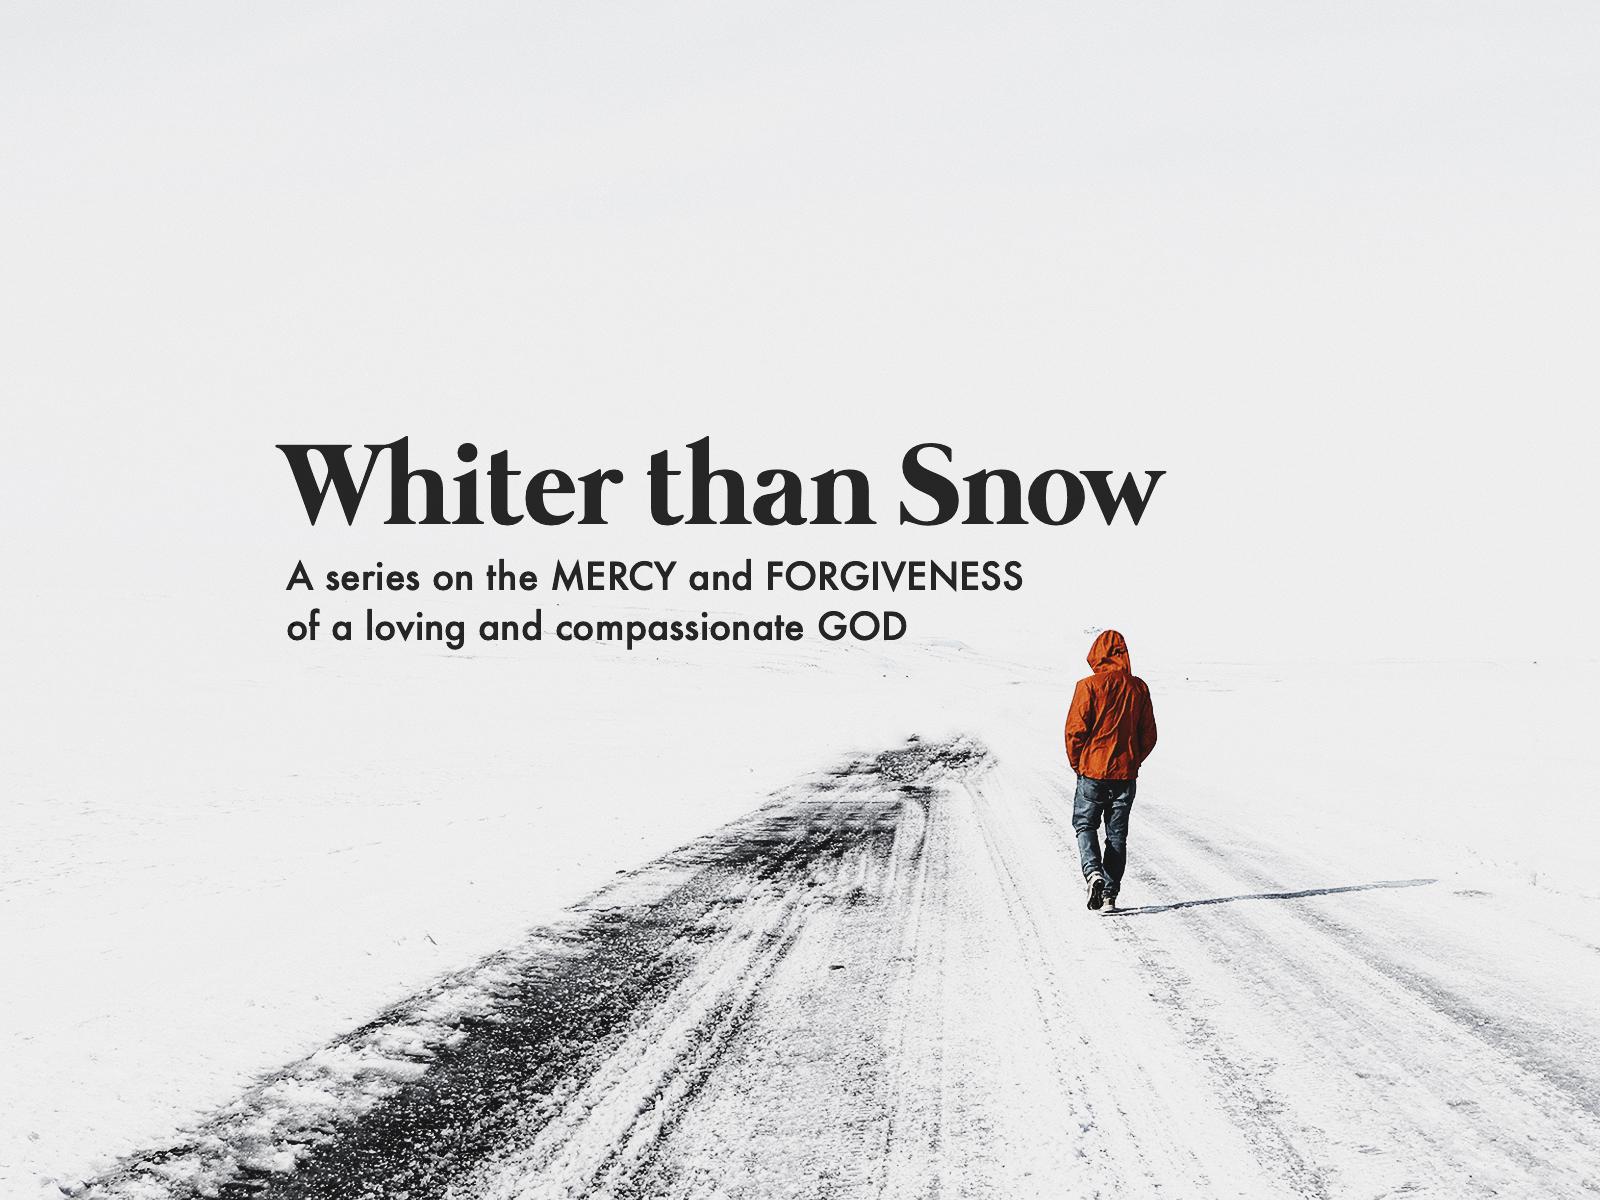 Whiter than Snow.jpg